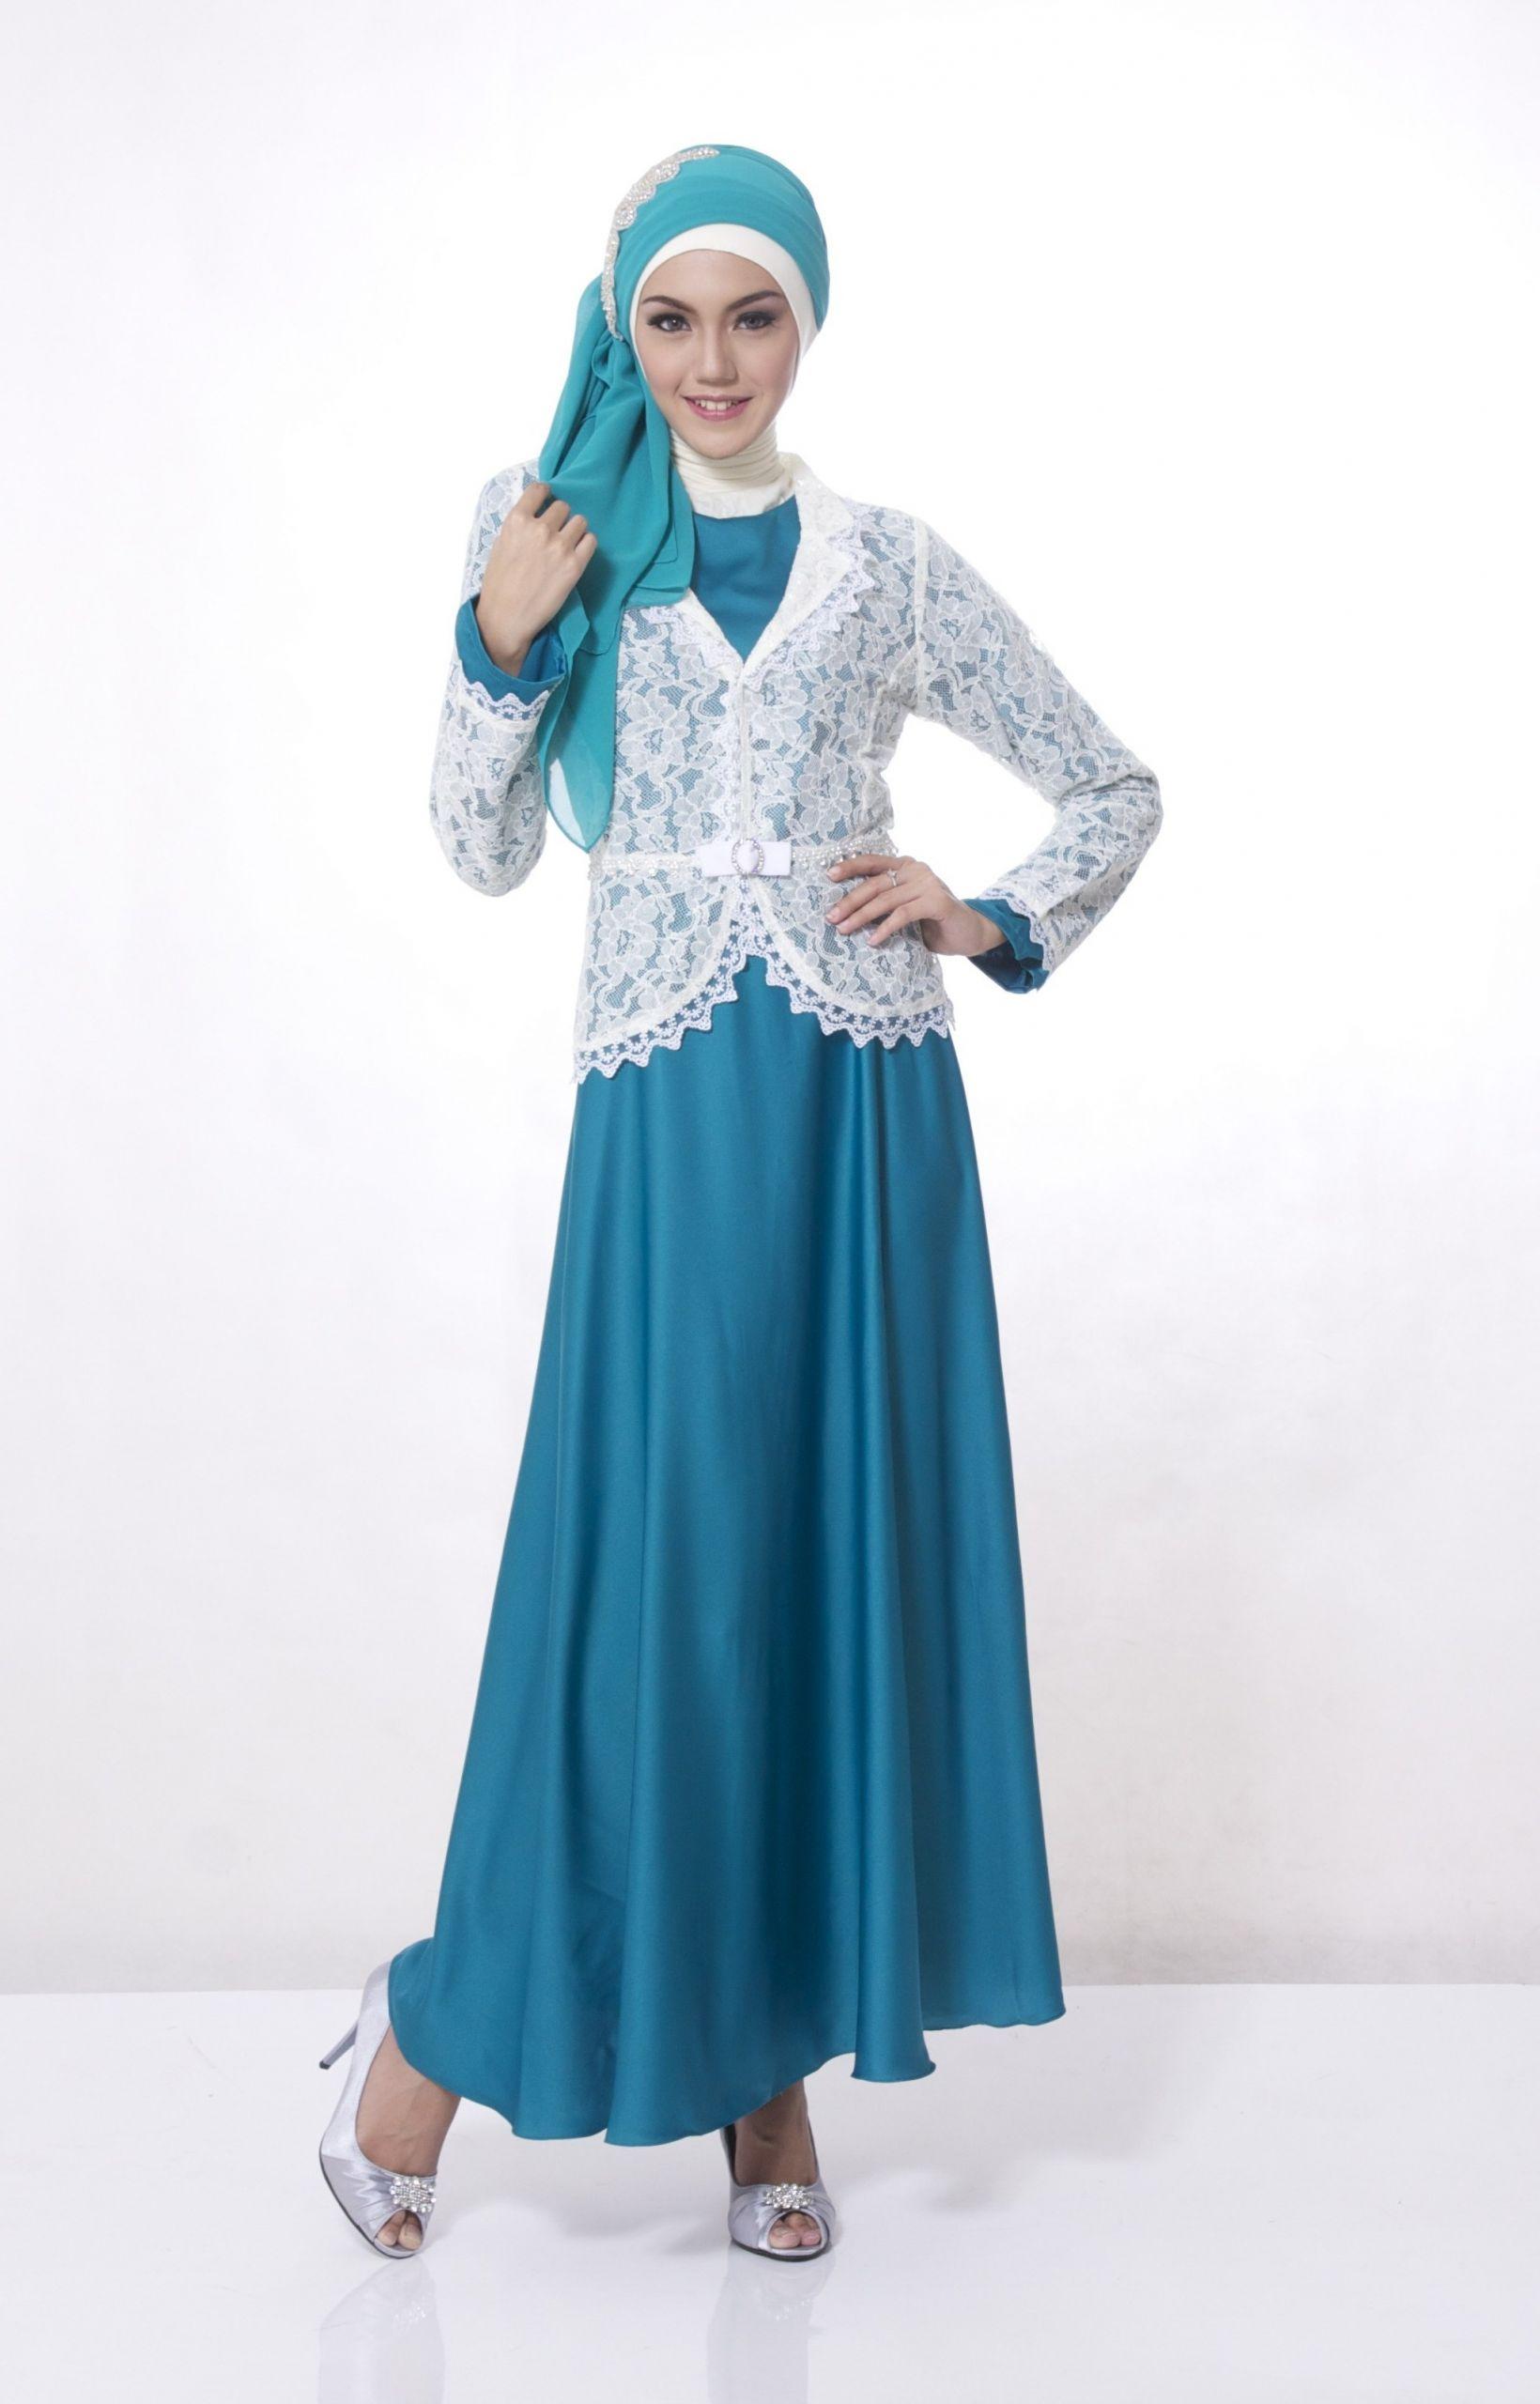 Inspirasi Contoh Baju Lebaran 4pde Contoh Desain Baju Muslim Terbaru Di 2015 – Pipitfashion